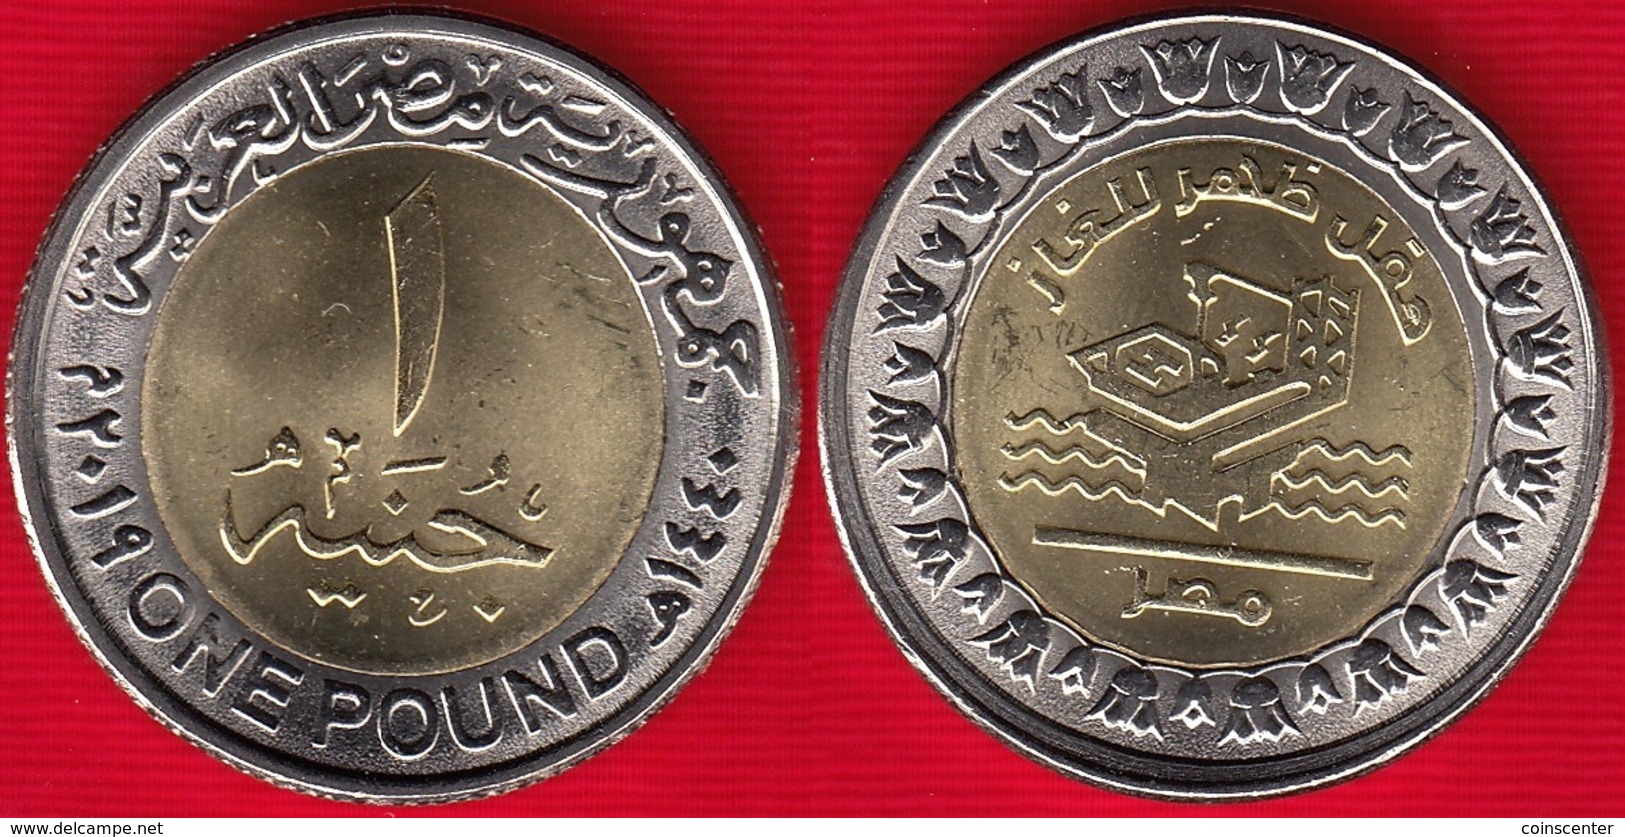 EGYPT 1 POUND 2019 NEW CAPITAL EGYPT NEW BIMETALLIC UNCIRCULATED COIN